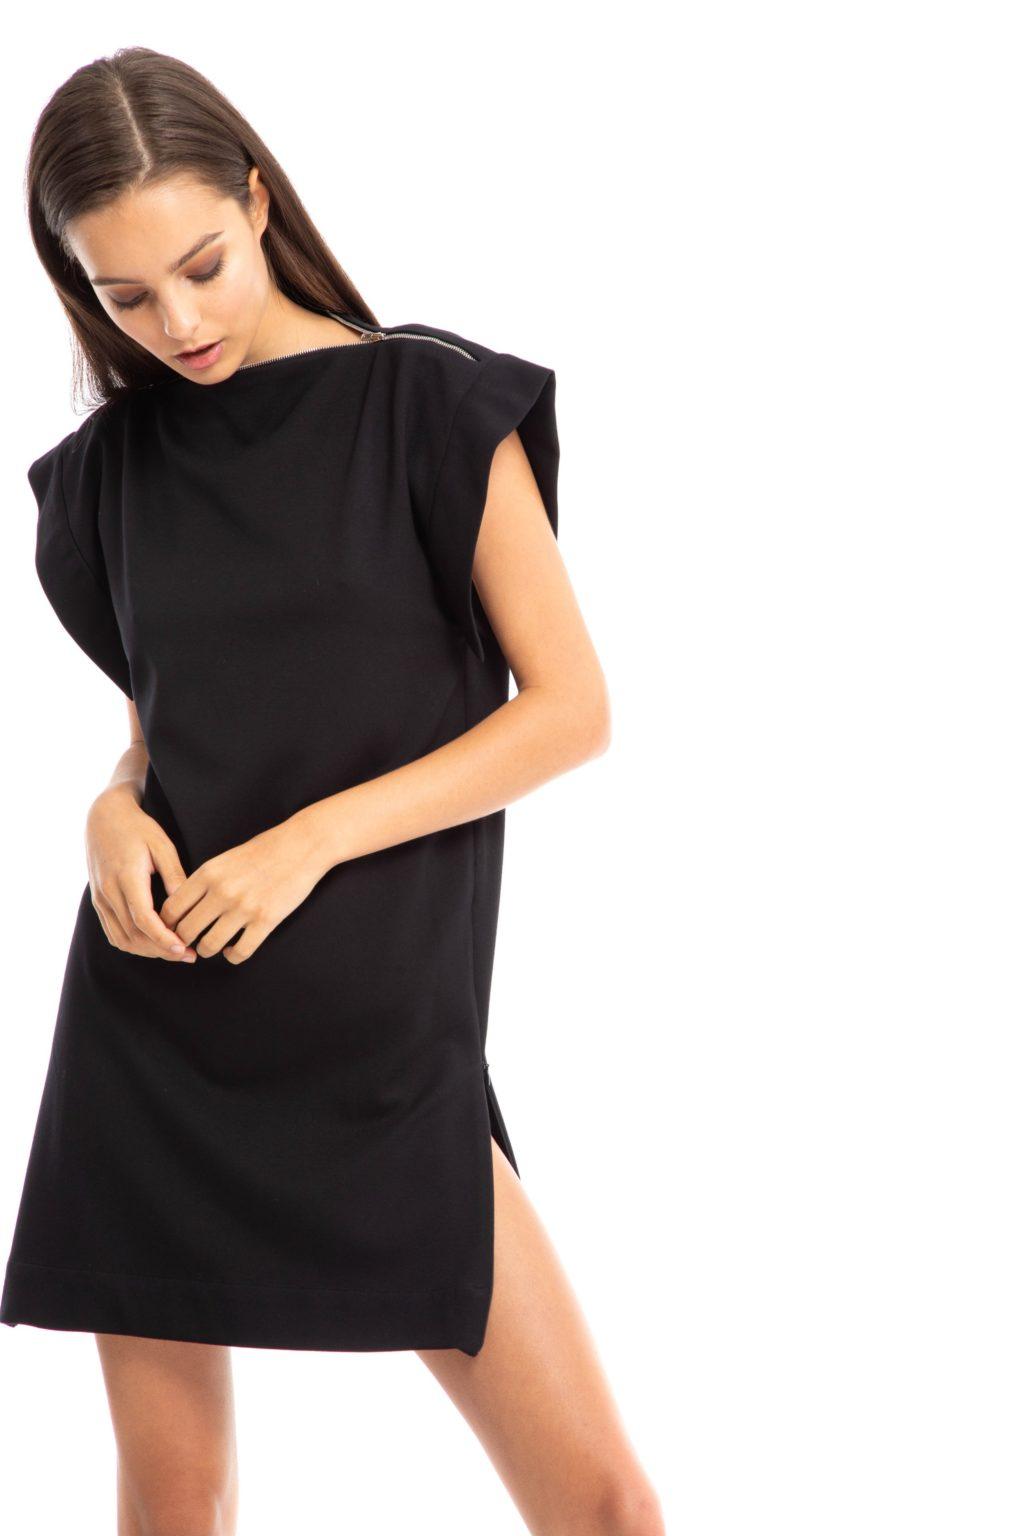 NINObrand's Z'ION Dress